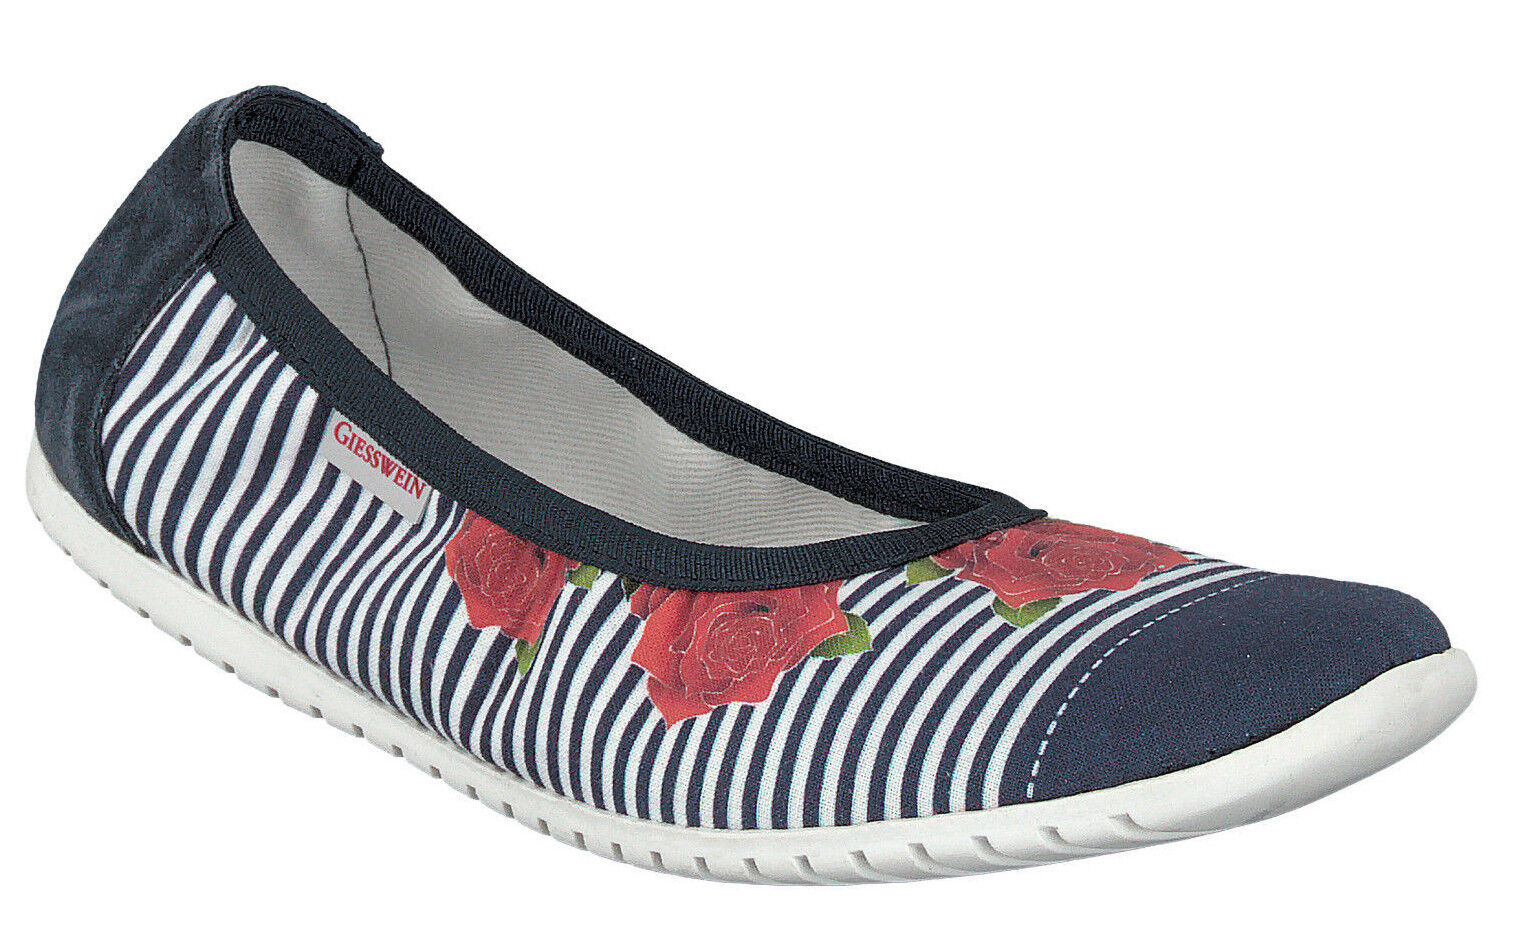 Giesswein 48290 48290 48290 deinstedt casa zapatos bailarinas algodón Print talla 36 - 42 nuevo  ventas de salida